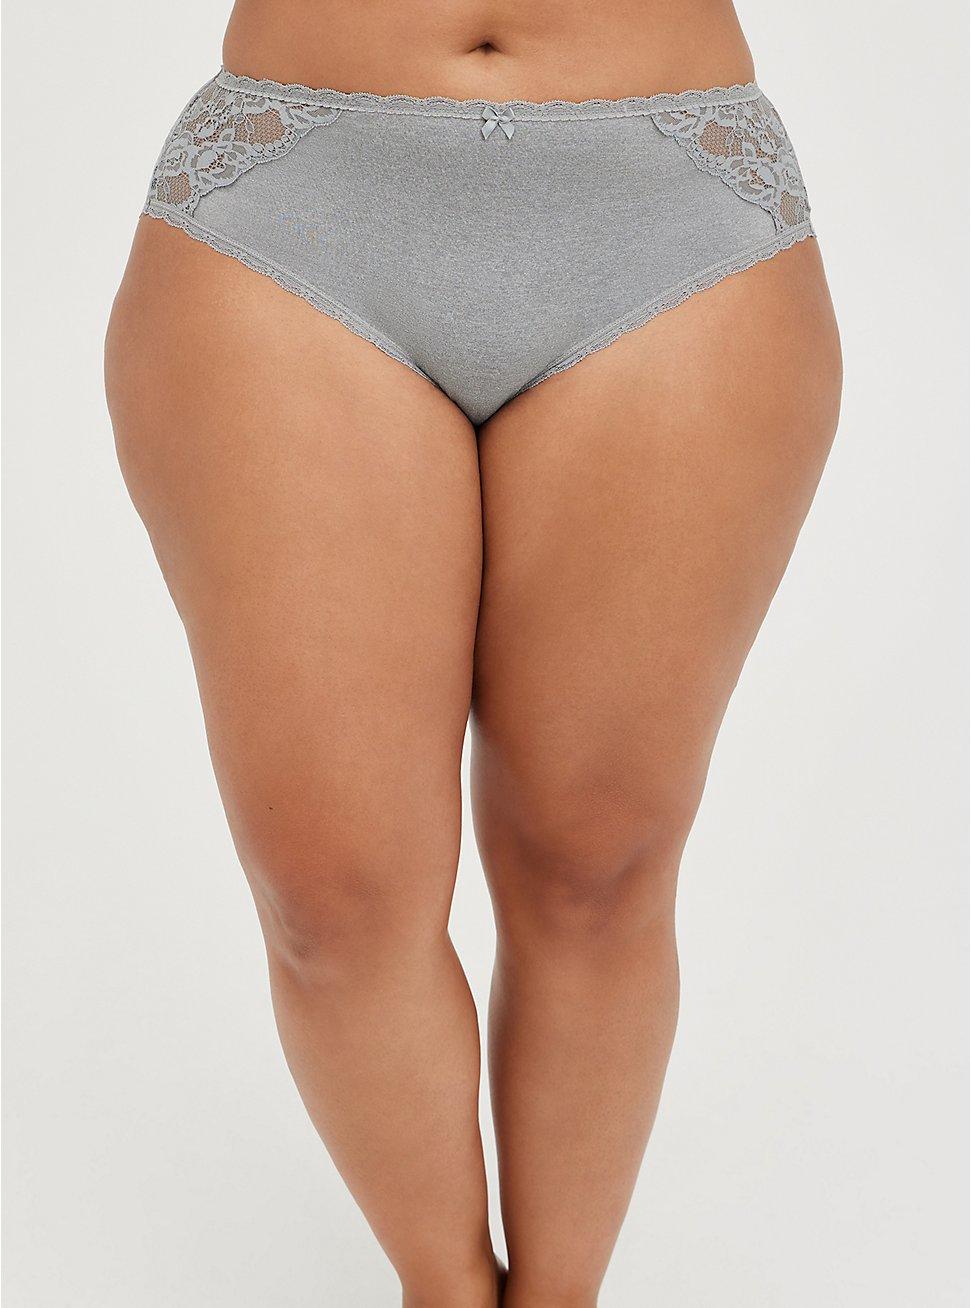 Lattice Back Hipster Panty - Lace Heather Grey , SHARKSKIN HEATHER GREY, hi-res